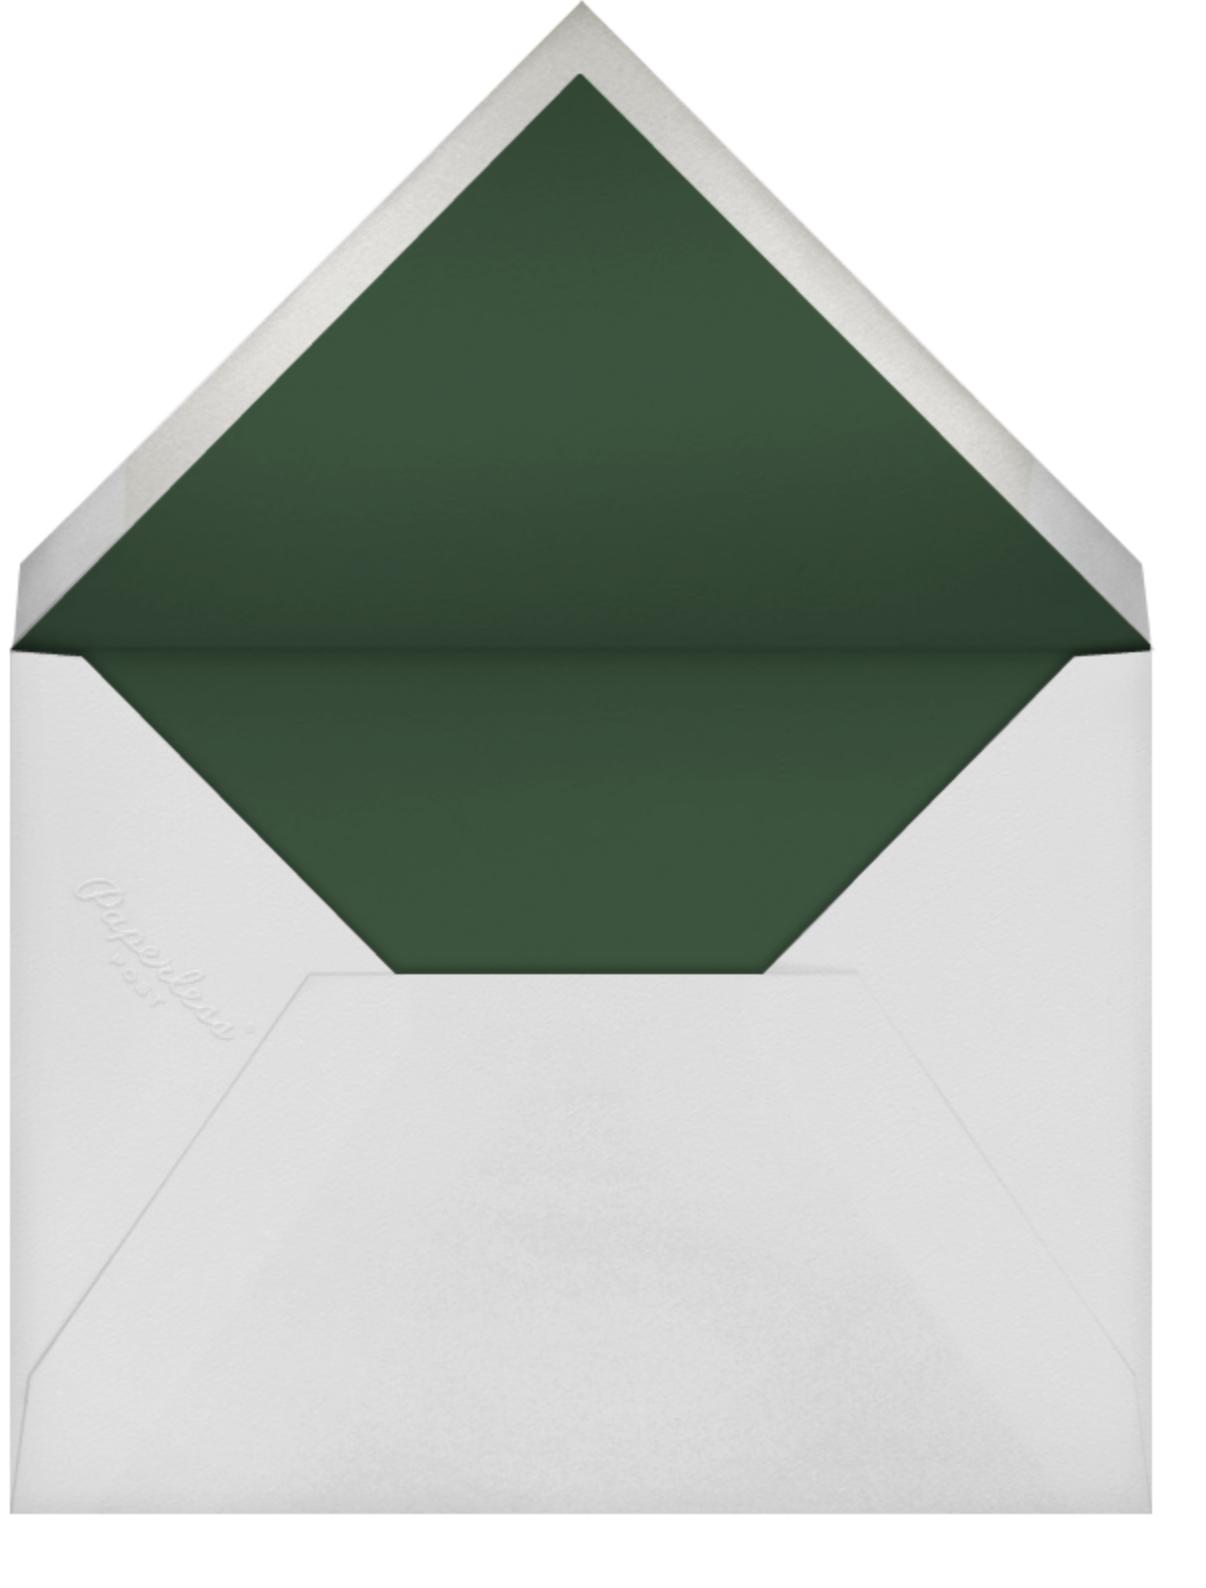 Embroidered Floral (Stationery) - Aquamarine  - Oscar de la Renta - Personalized stationery - envelope back